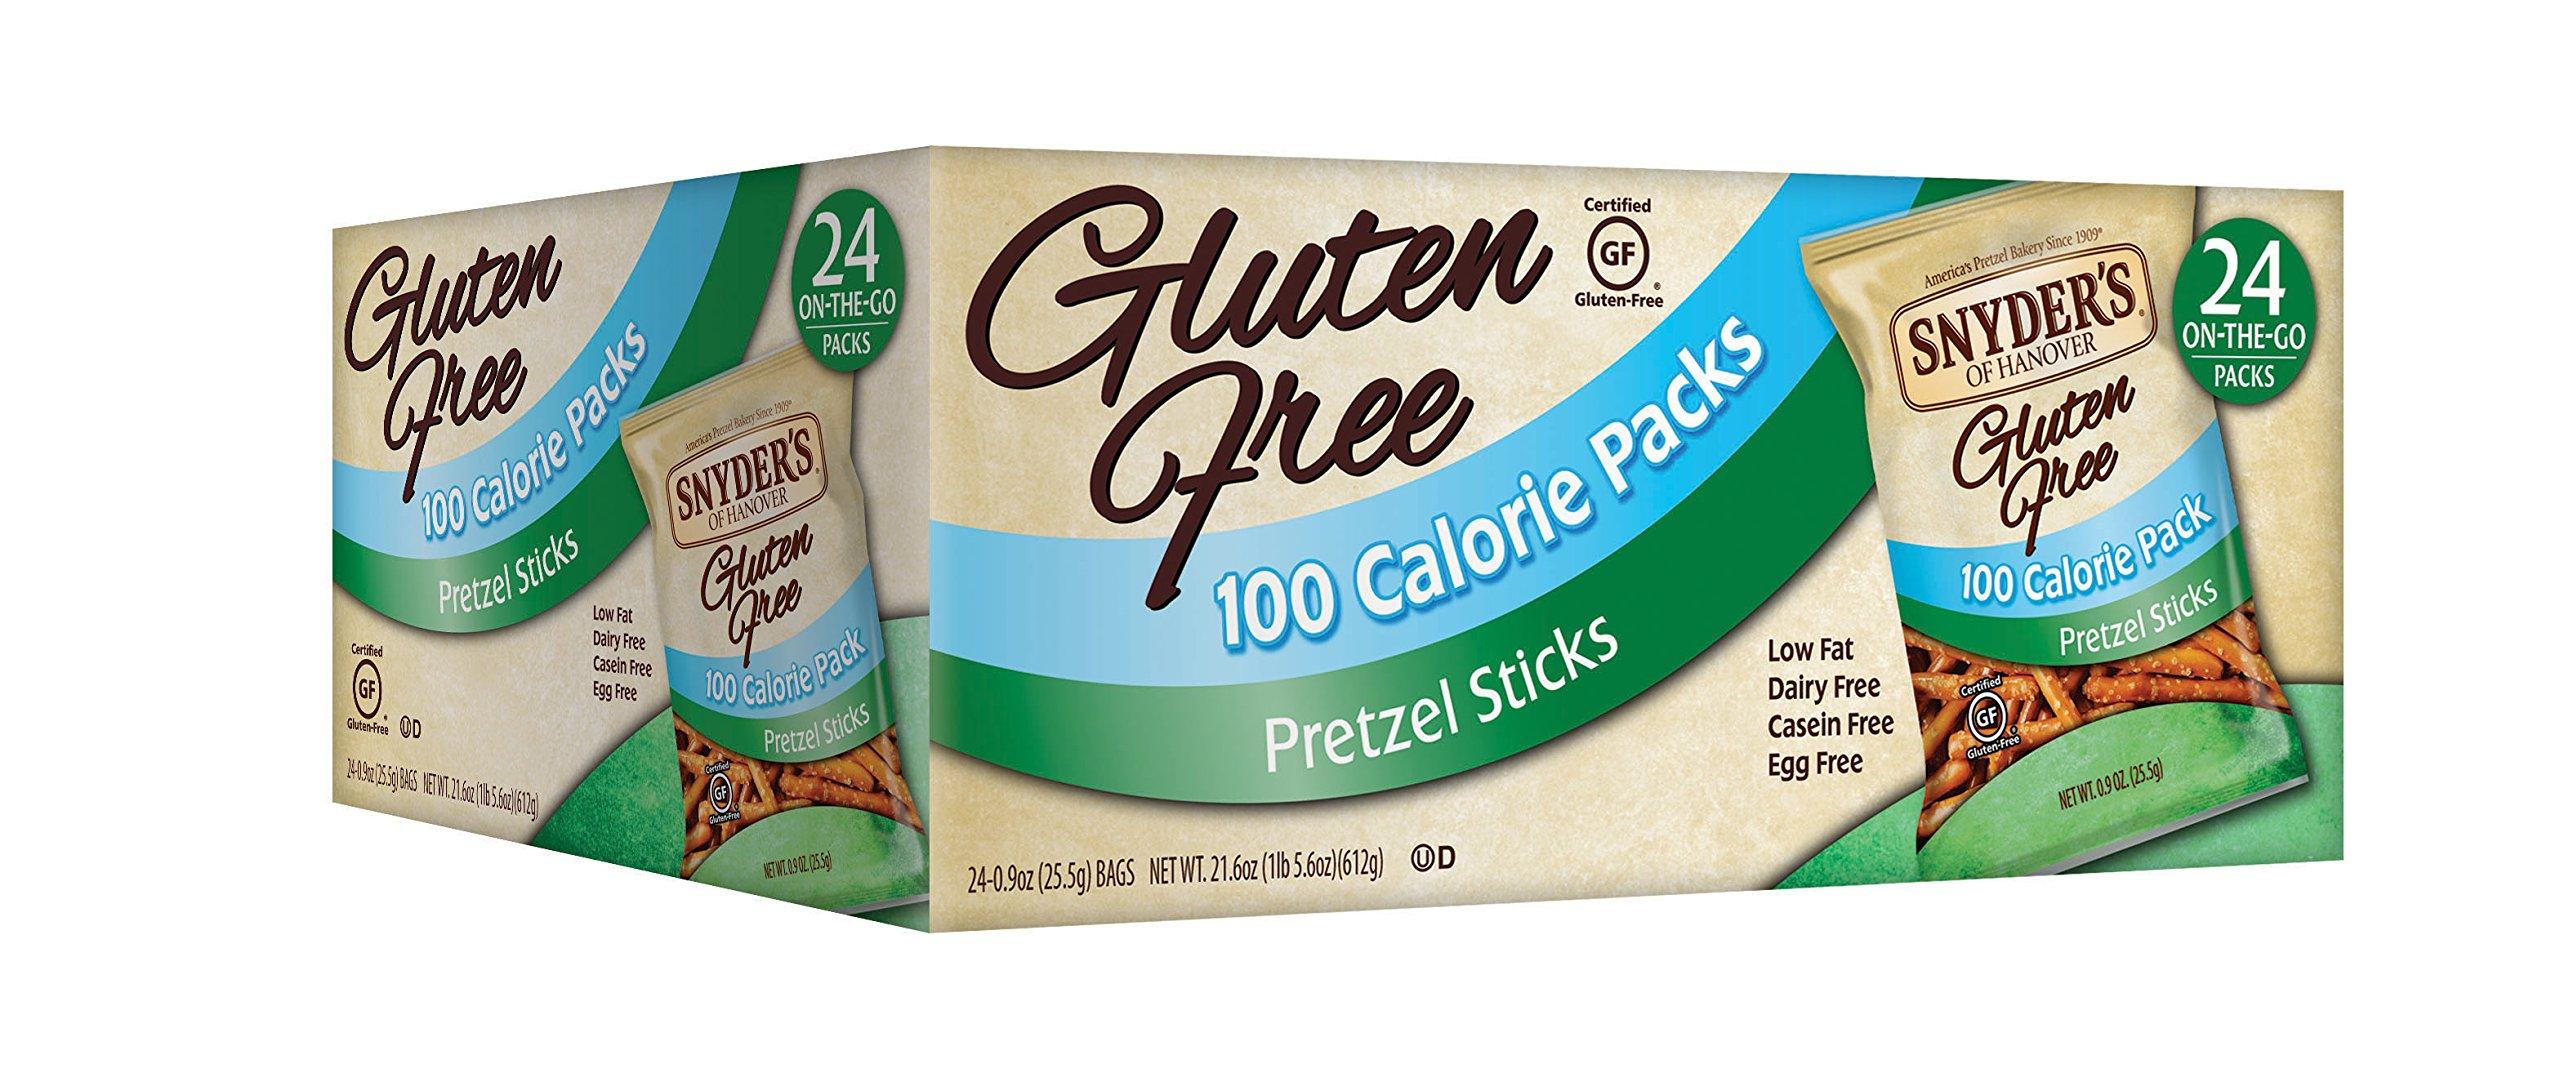 Snyder's of Hanover Gluten Free 100 Calorie Pretzel Sticks, 24 Count